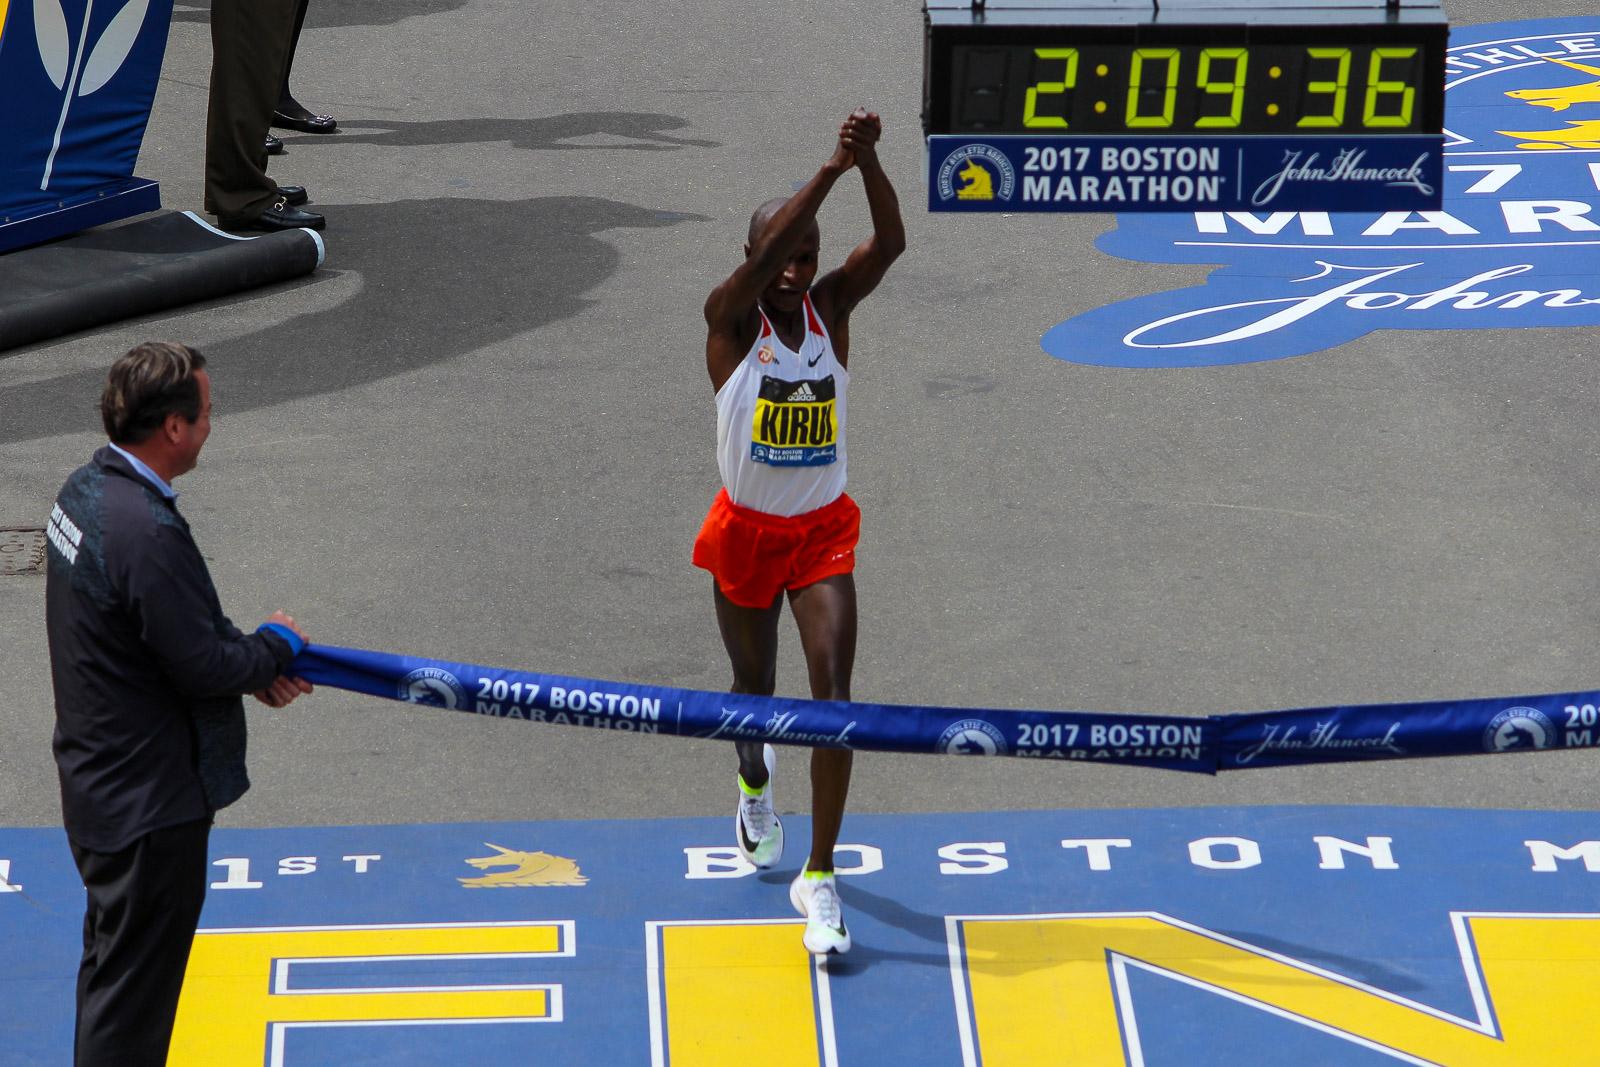 Geoffrey Kirui wins the 121st Boston Marathon. Photo: Michael Doyle